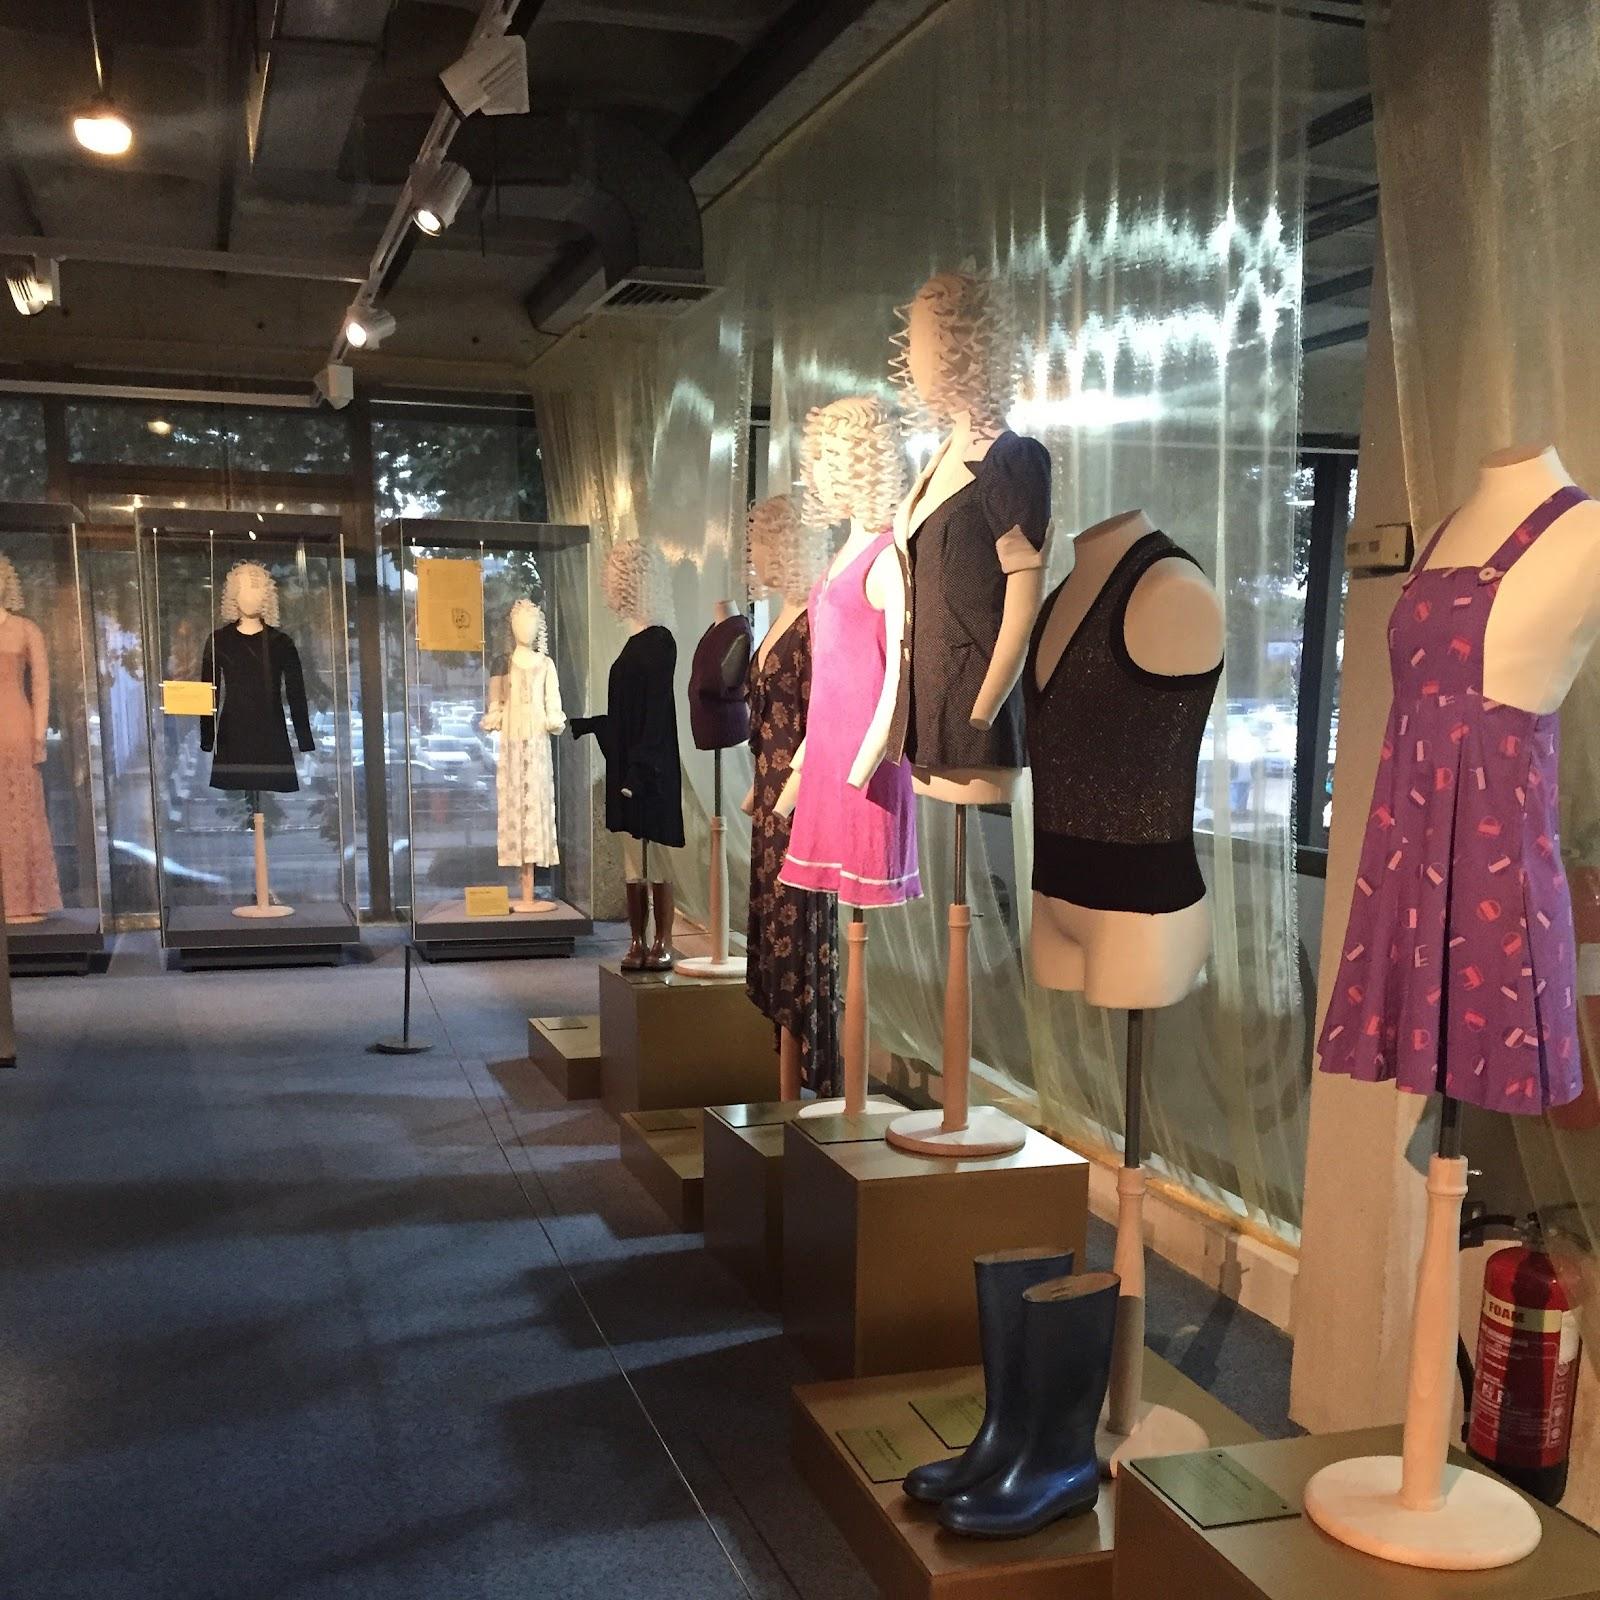 BIBA: The Fashion. The Lifestyle. The Brand - Style ...